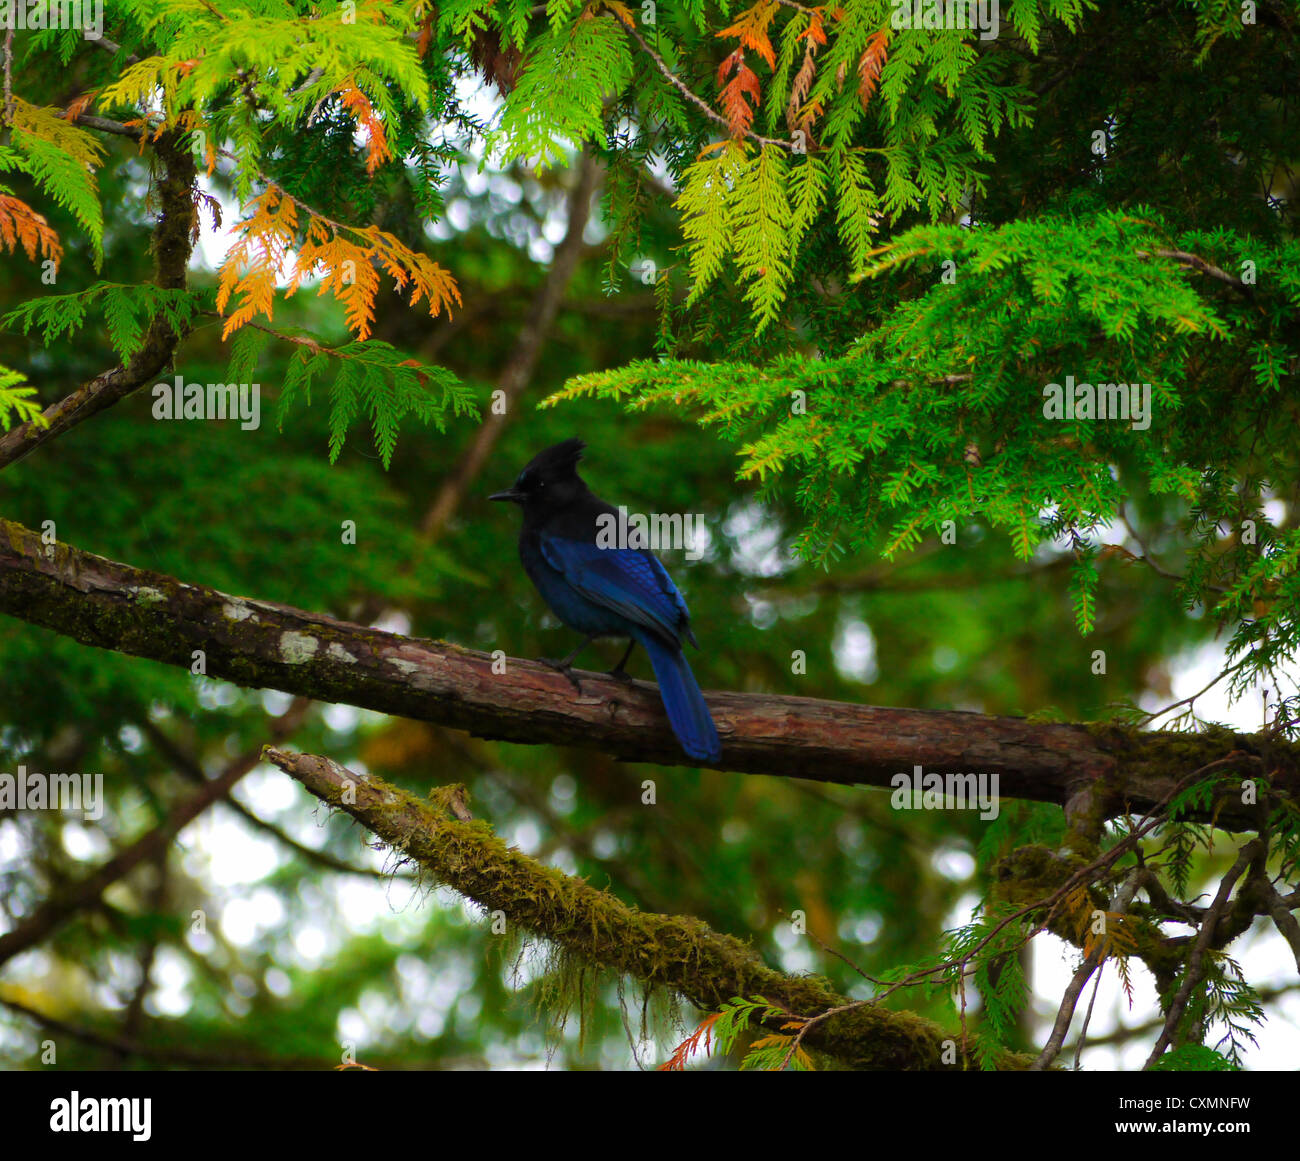 Blue stellar jay in cedar tree - Stock Image